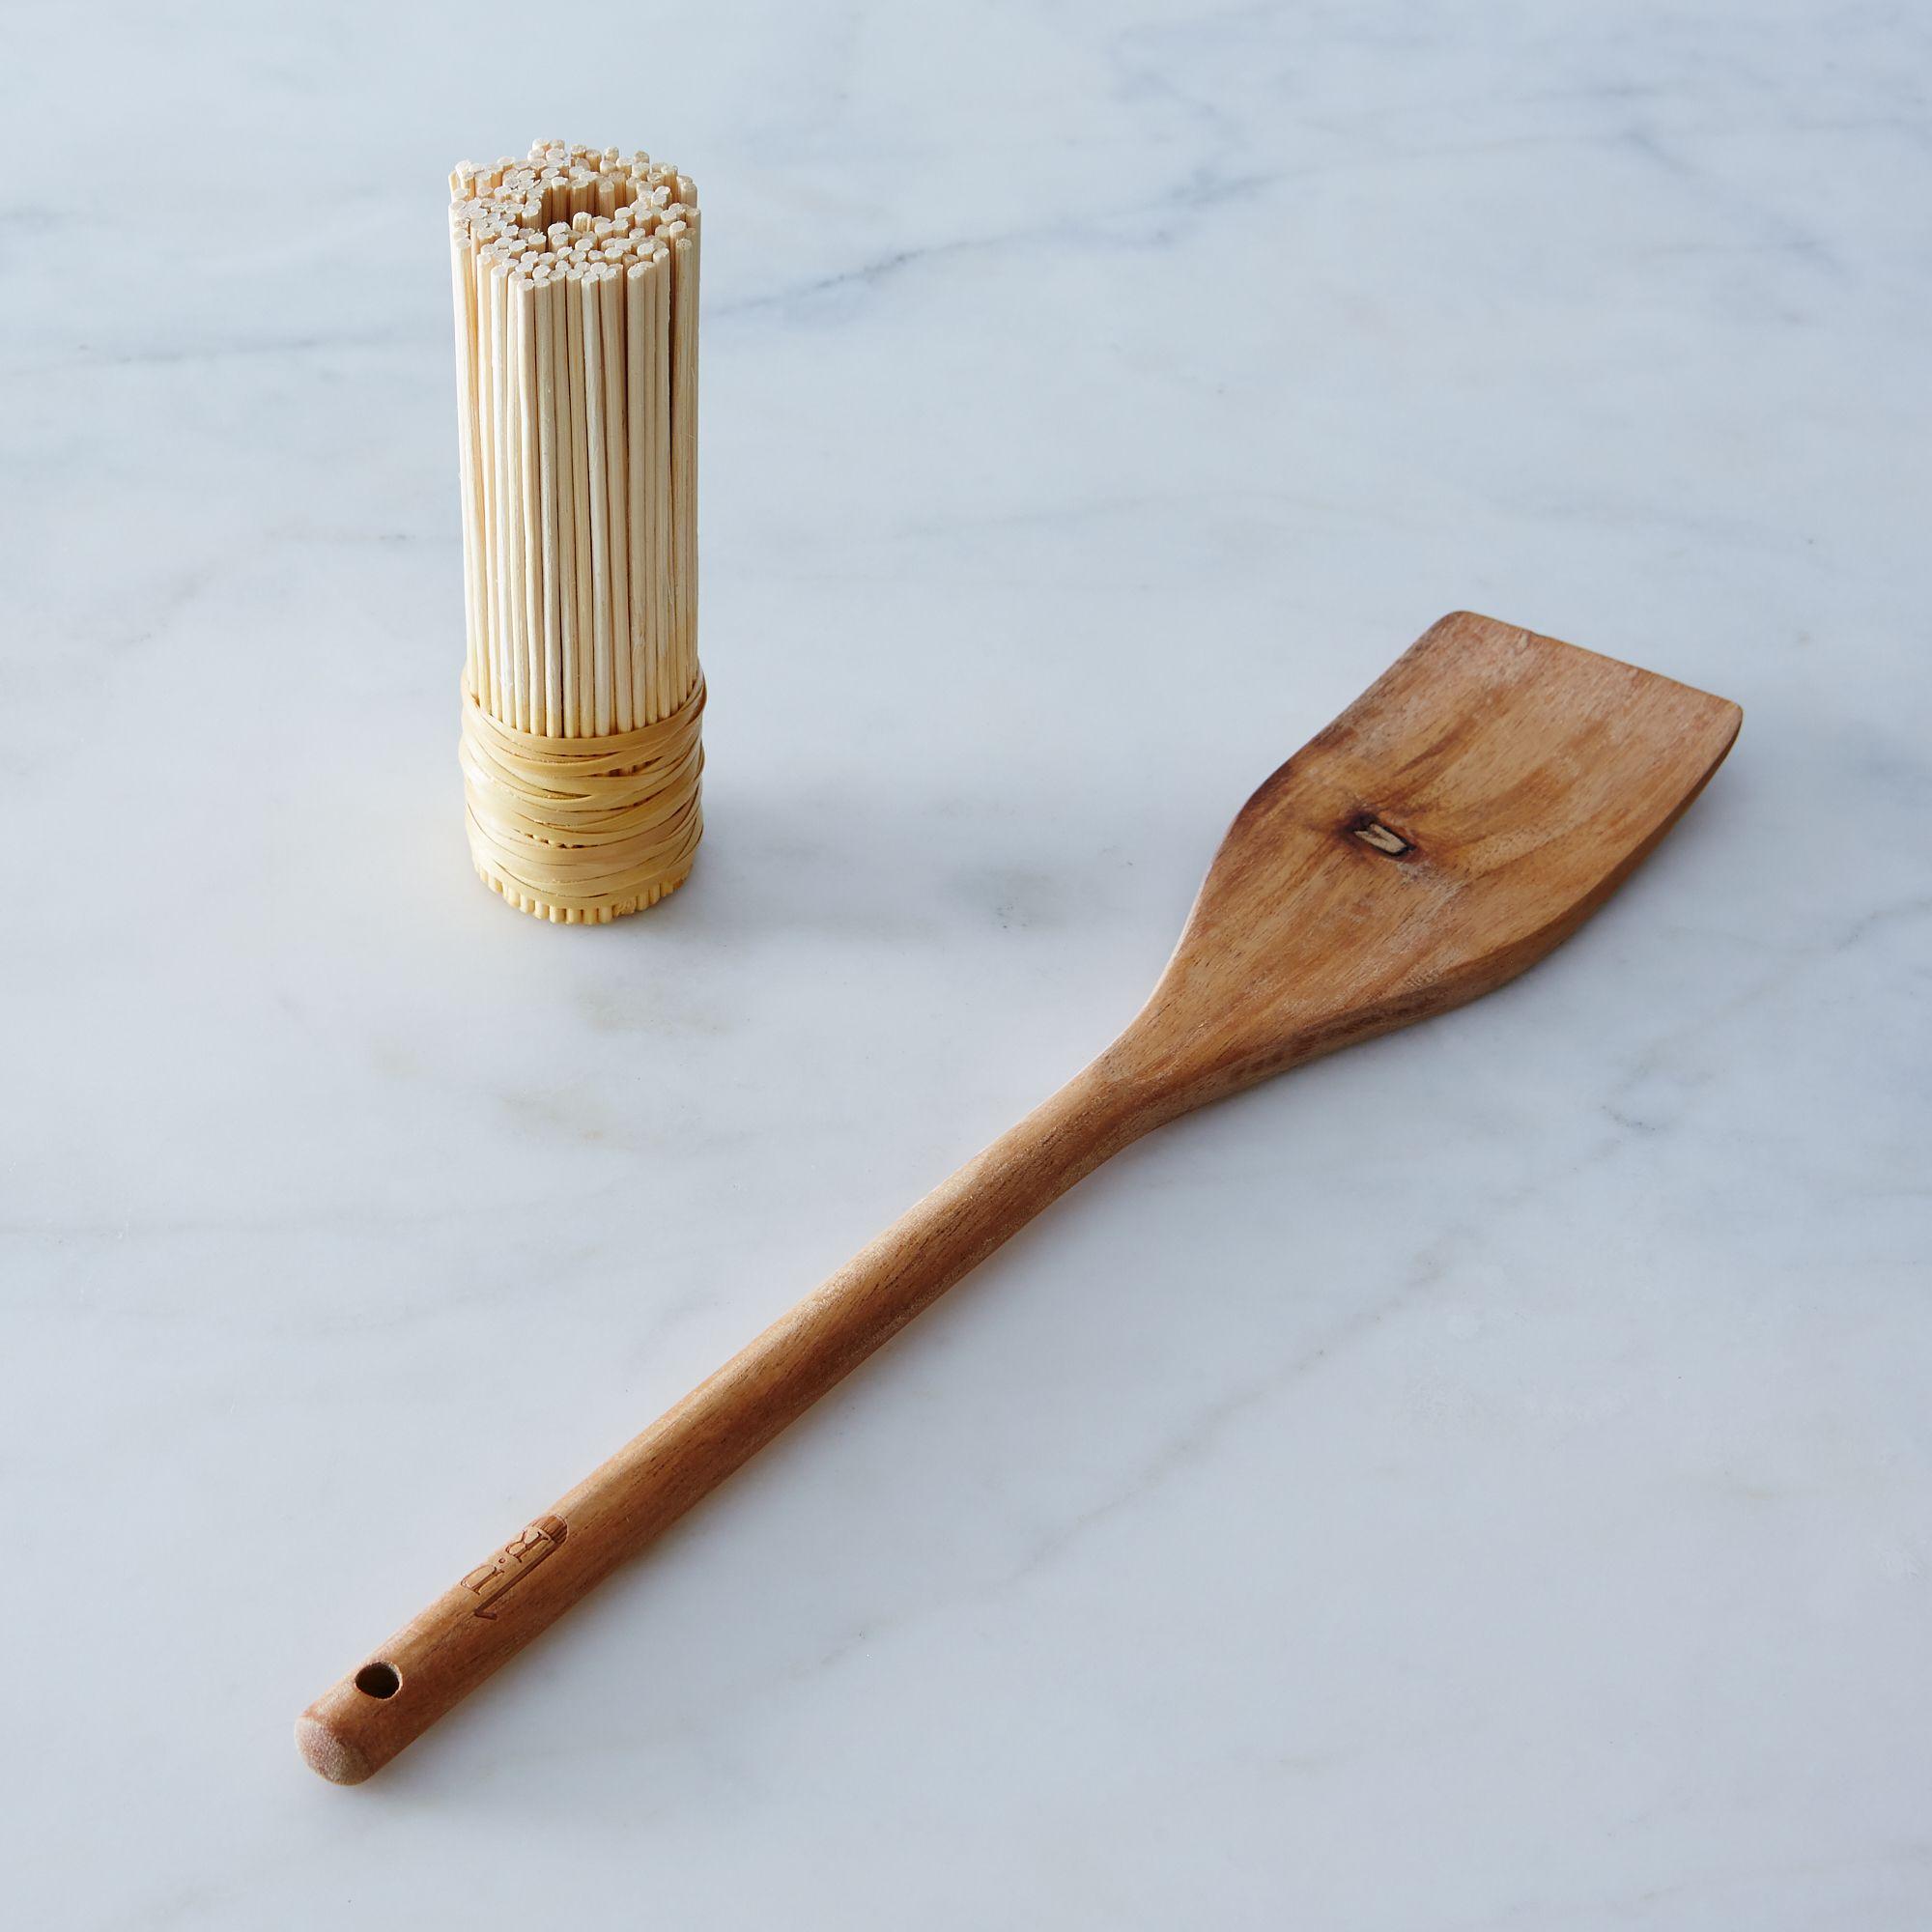 0f60deb1 3223 4f4c ae39 c3187804c580  ruhlman bamboo scrubber silo 0172 provisions mark weinberg